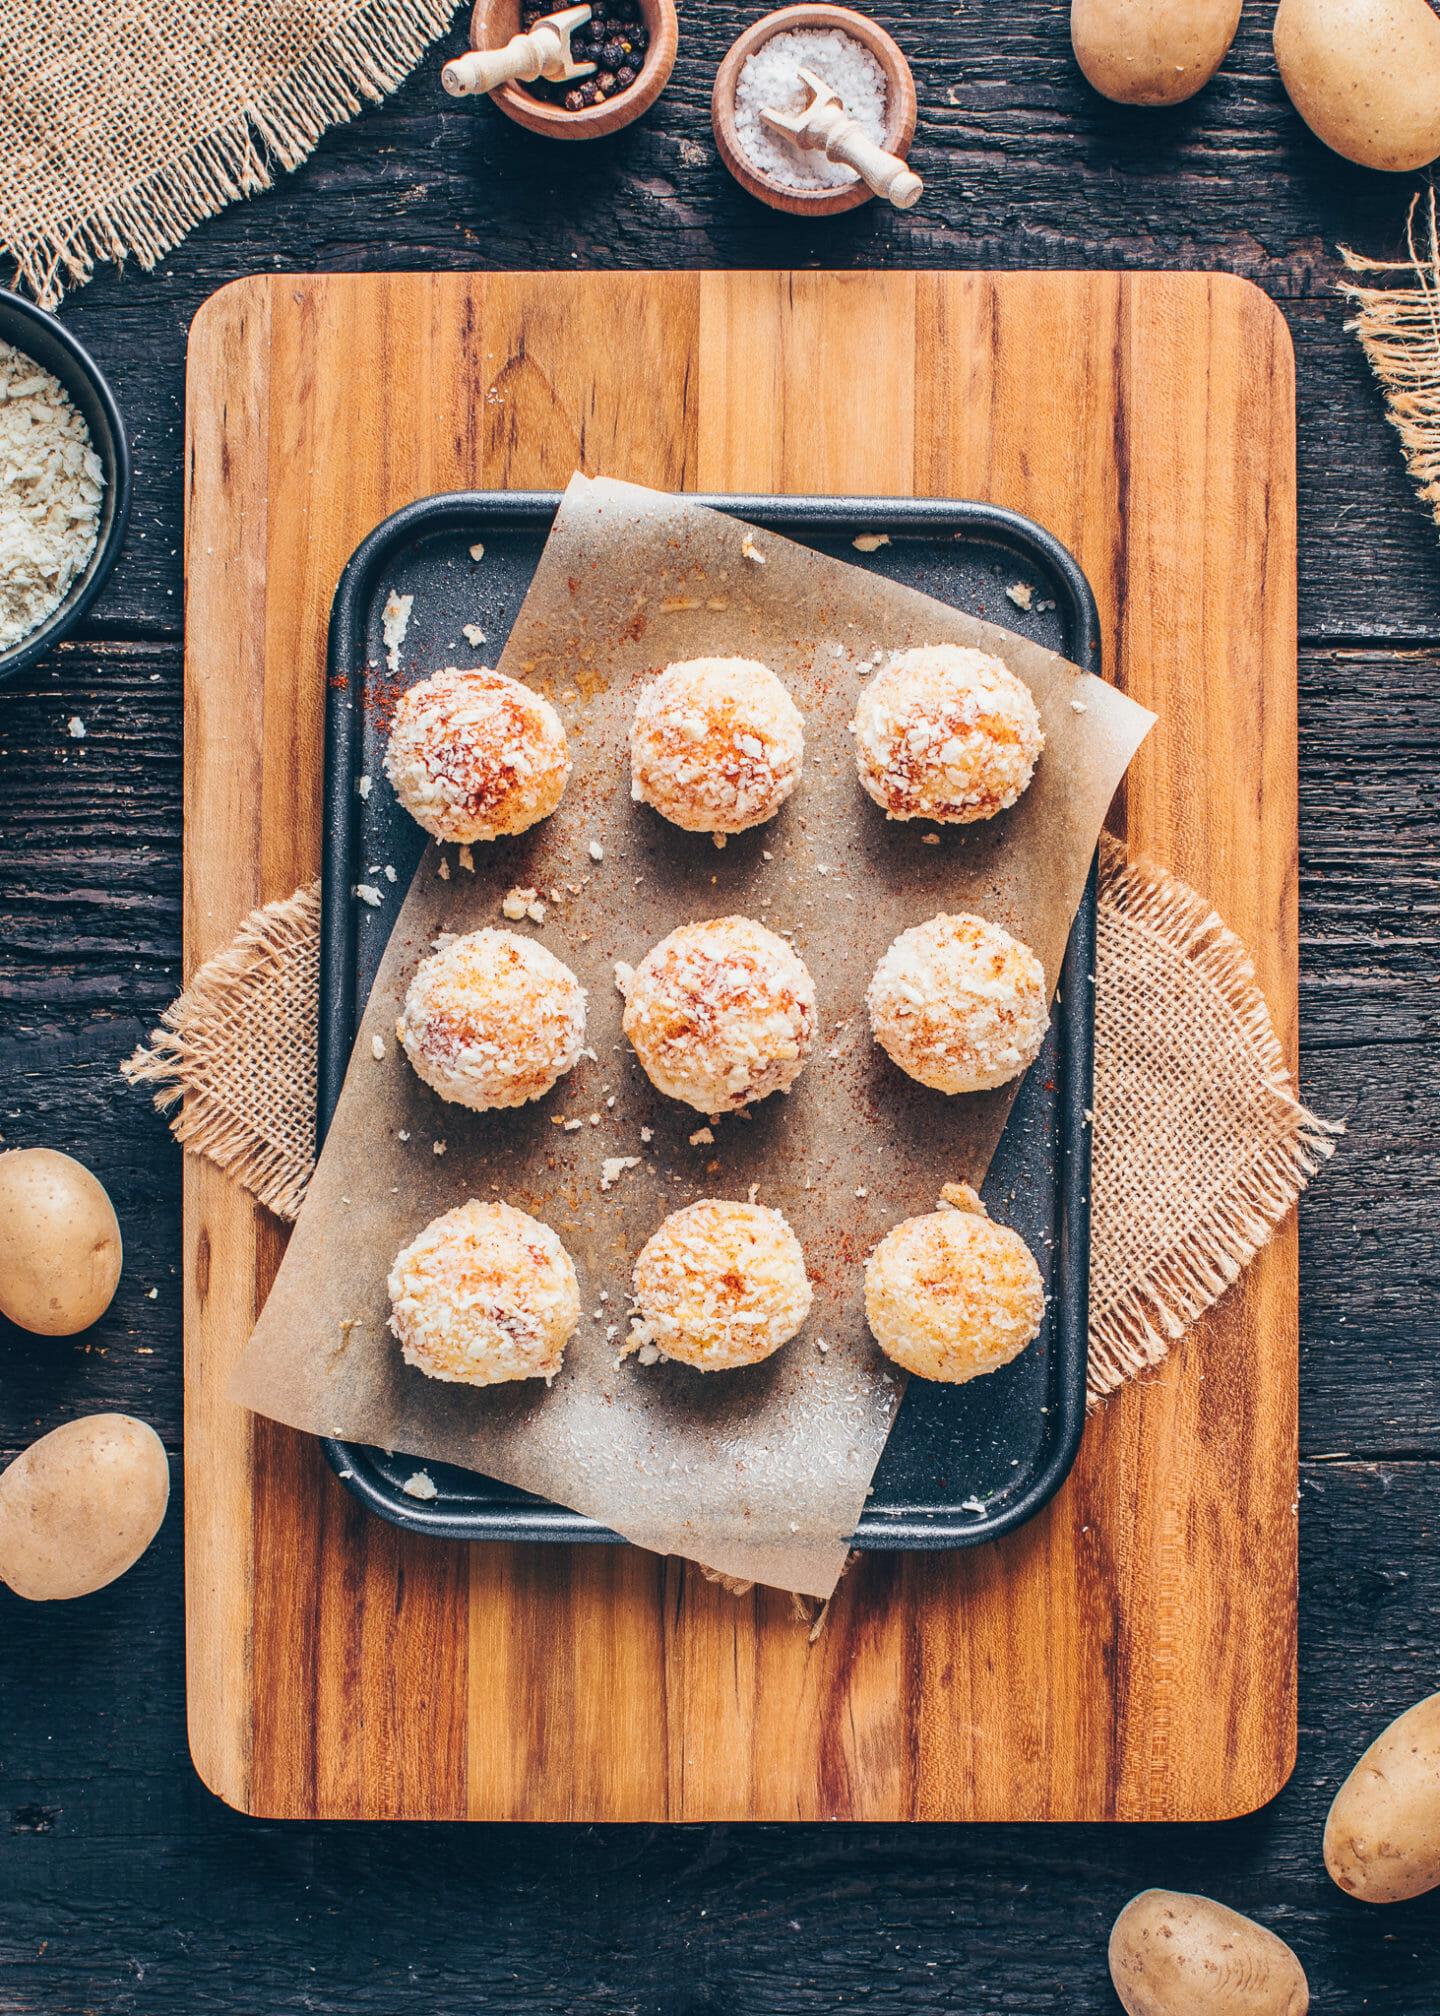 homemade potato croquettes balls (tater tots)